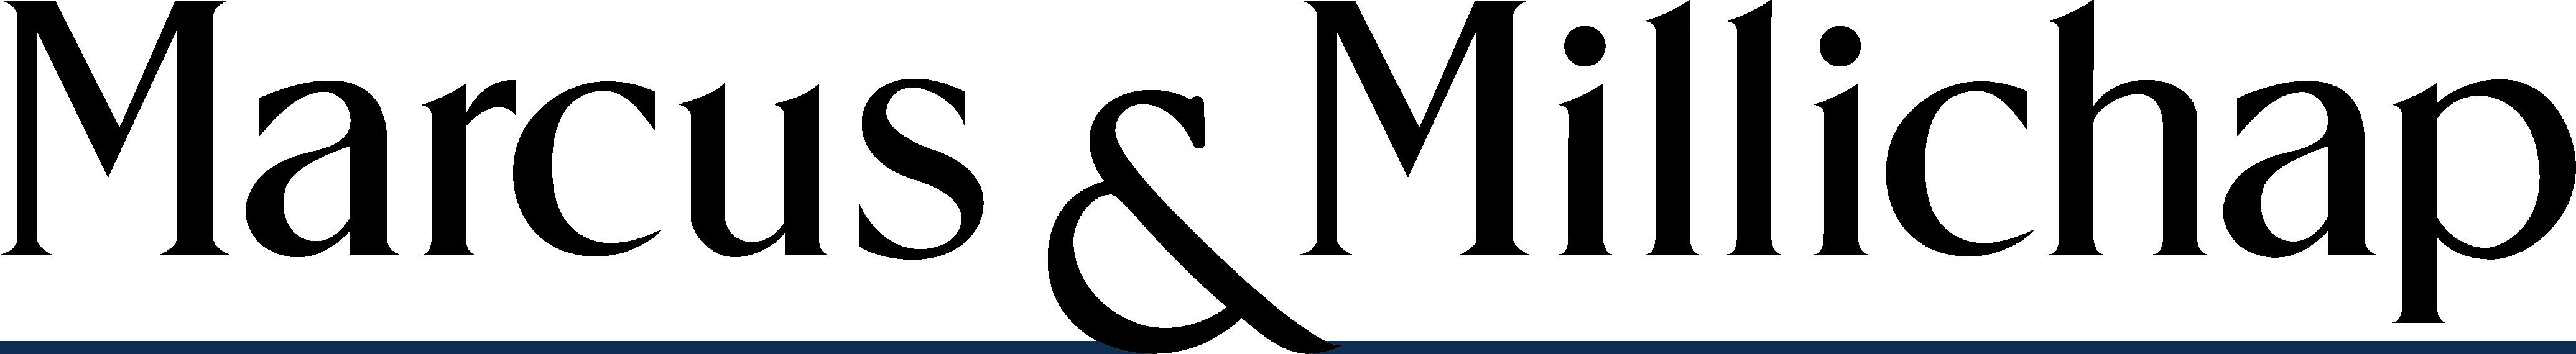 Marcus & Millichap logo